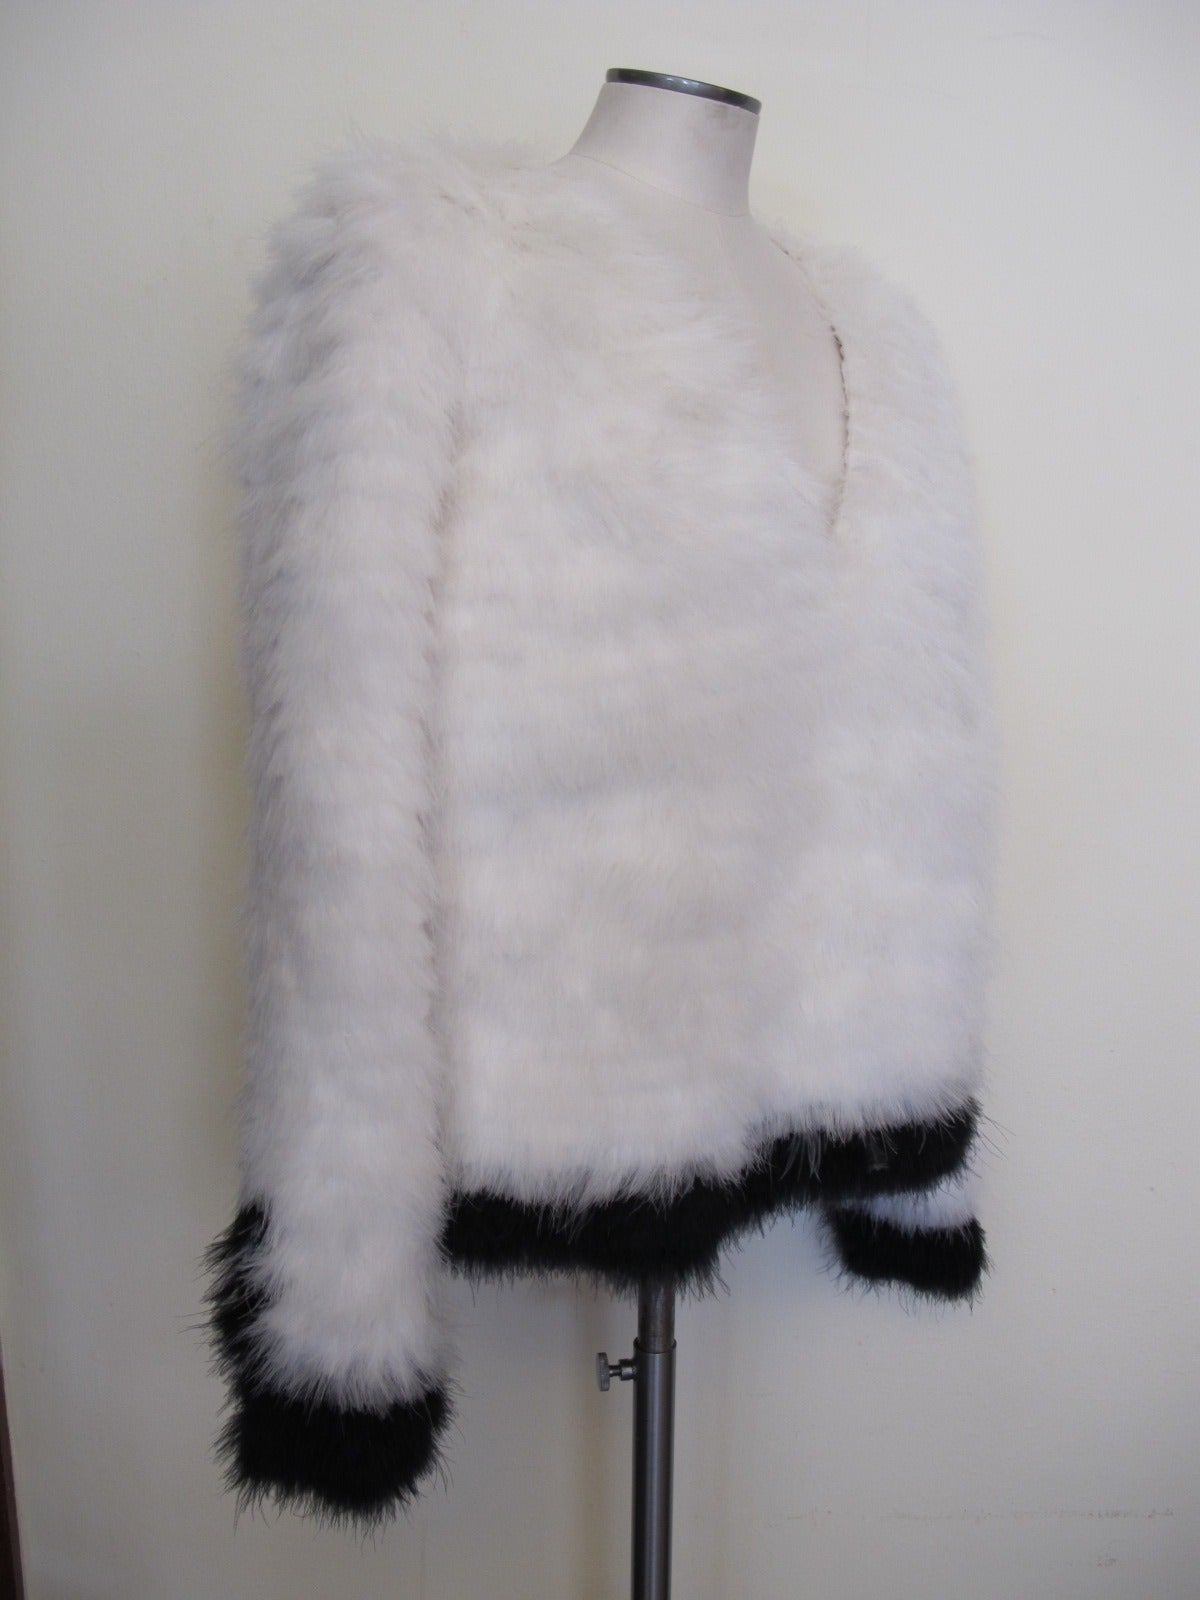 Tom Ford New Luxurious Marabou Jacket 2012 2